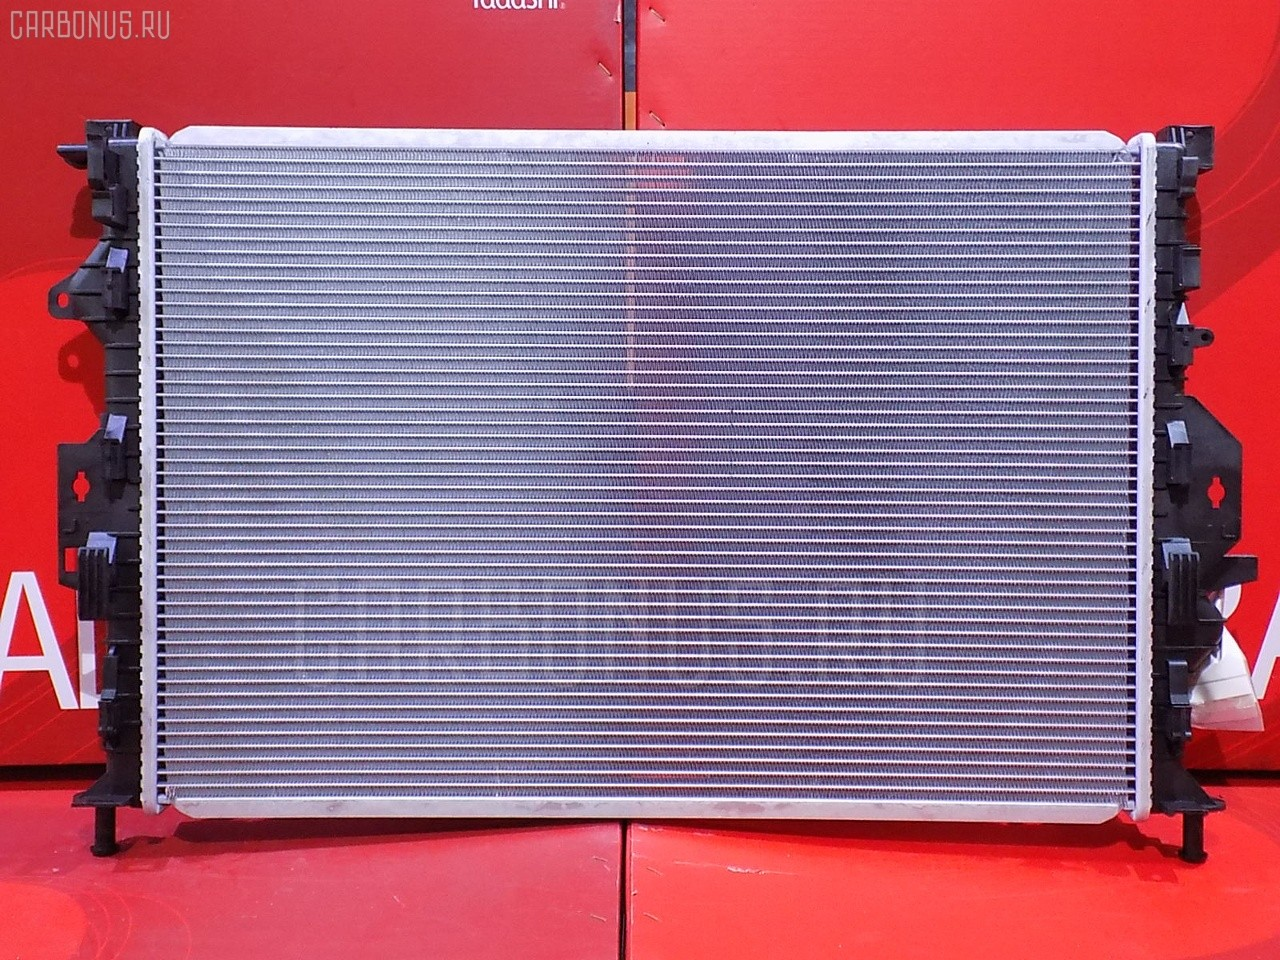 Радиатор ДВС TADASHI TD-036-0156 на Ford C-Max CB3 G6DC Фото 1